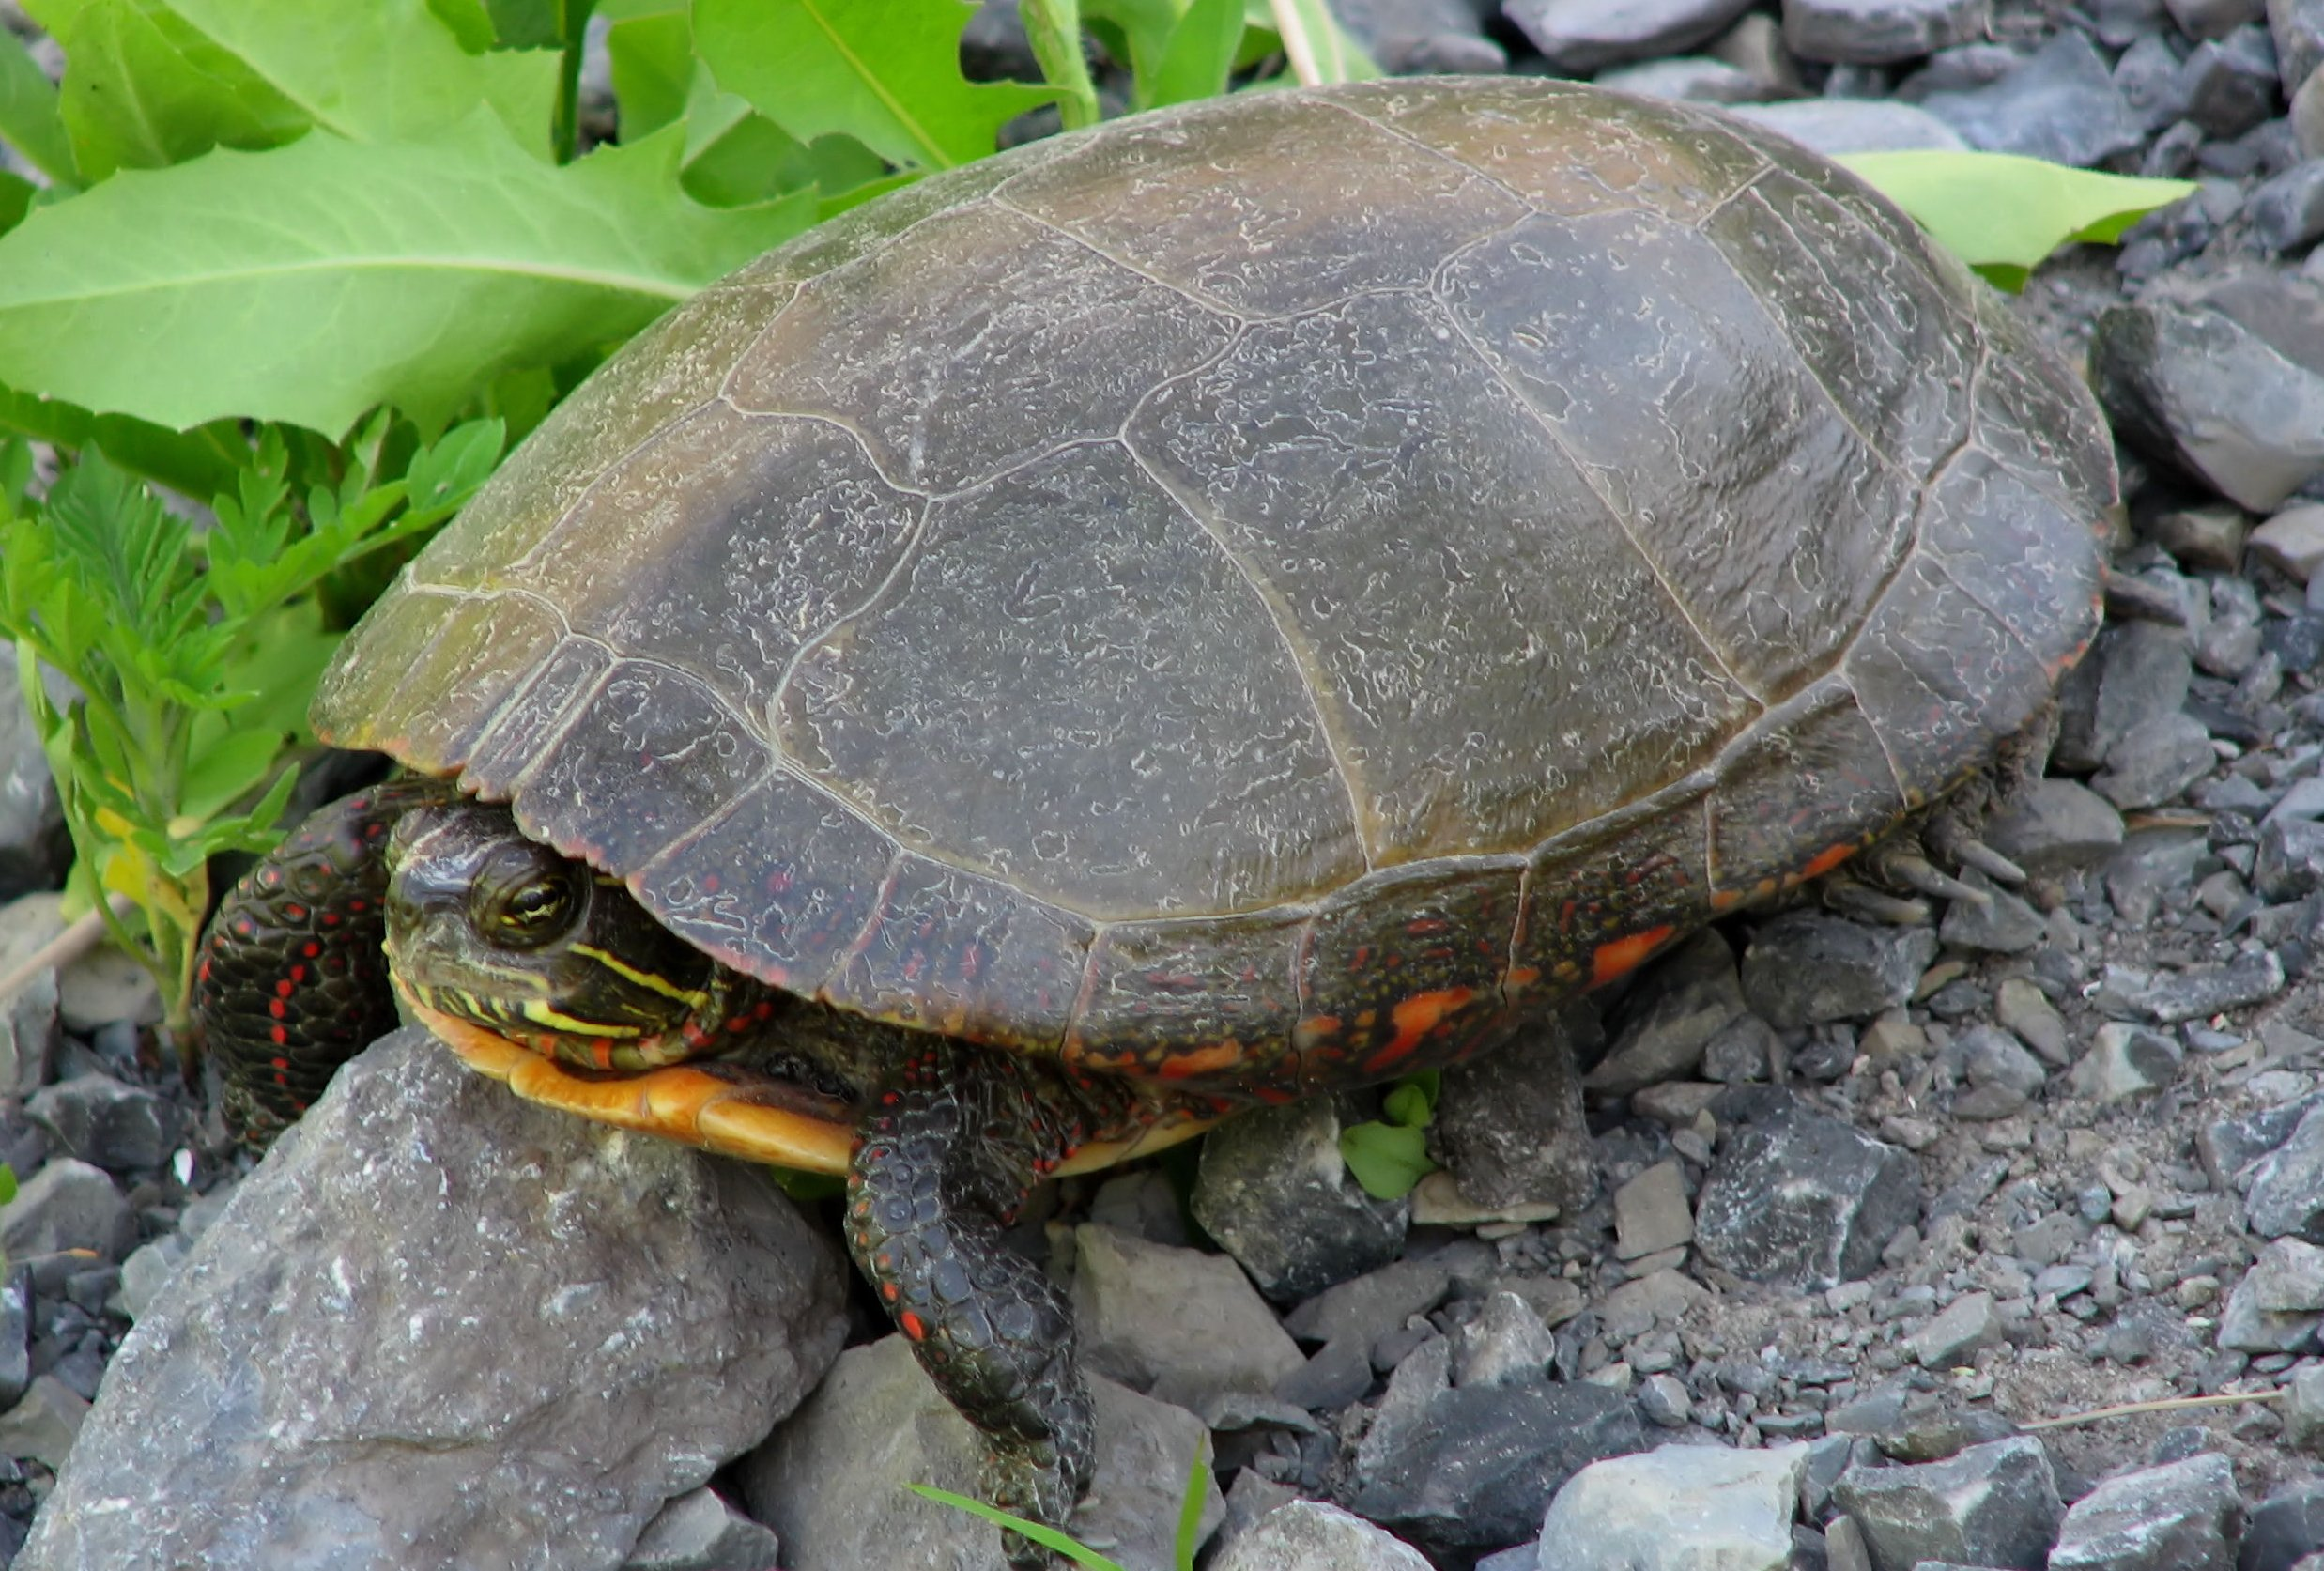 Alfa img - Showing > Identify Water Turtles